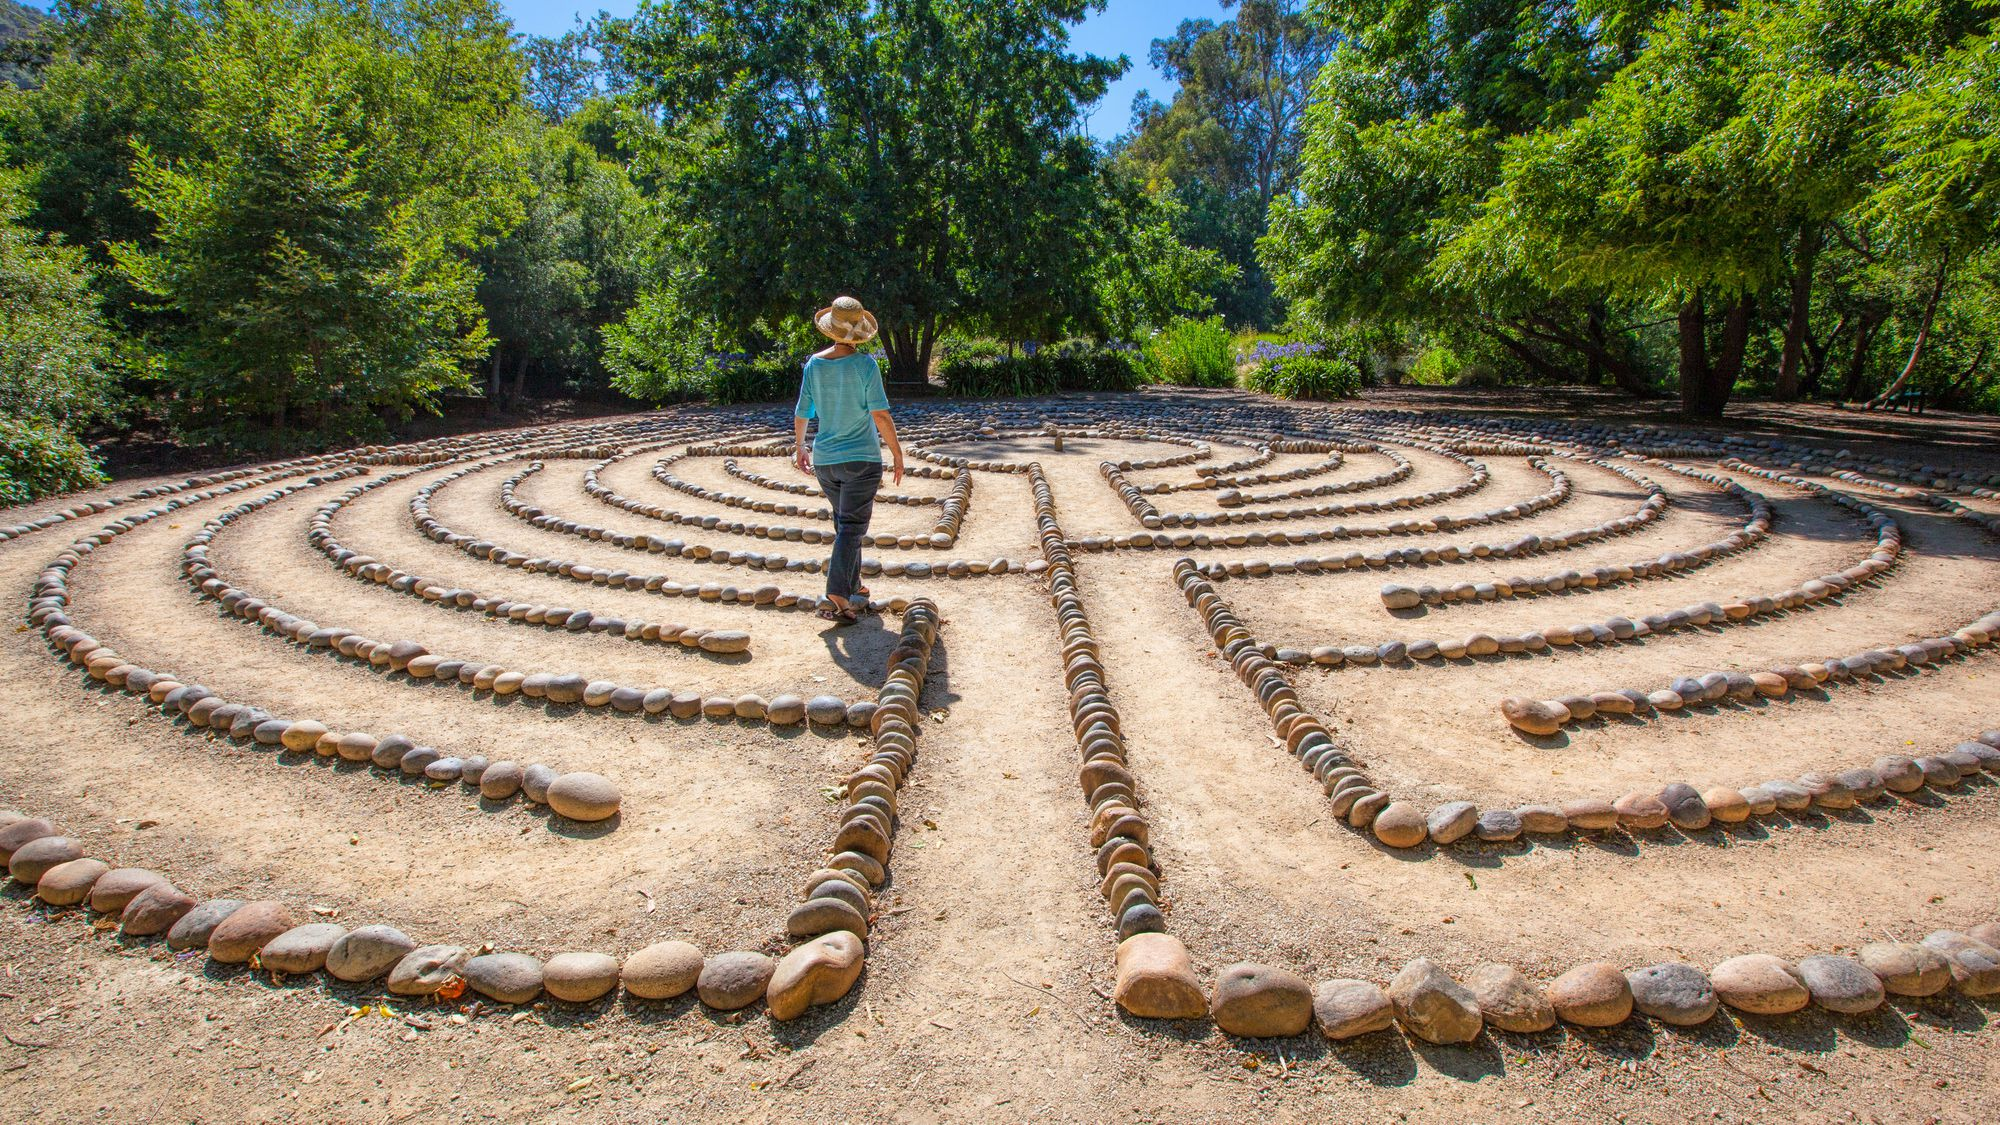 Walking a Labyrinth as Spiritual Exercise